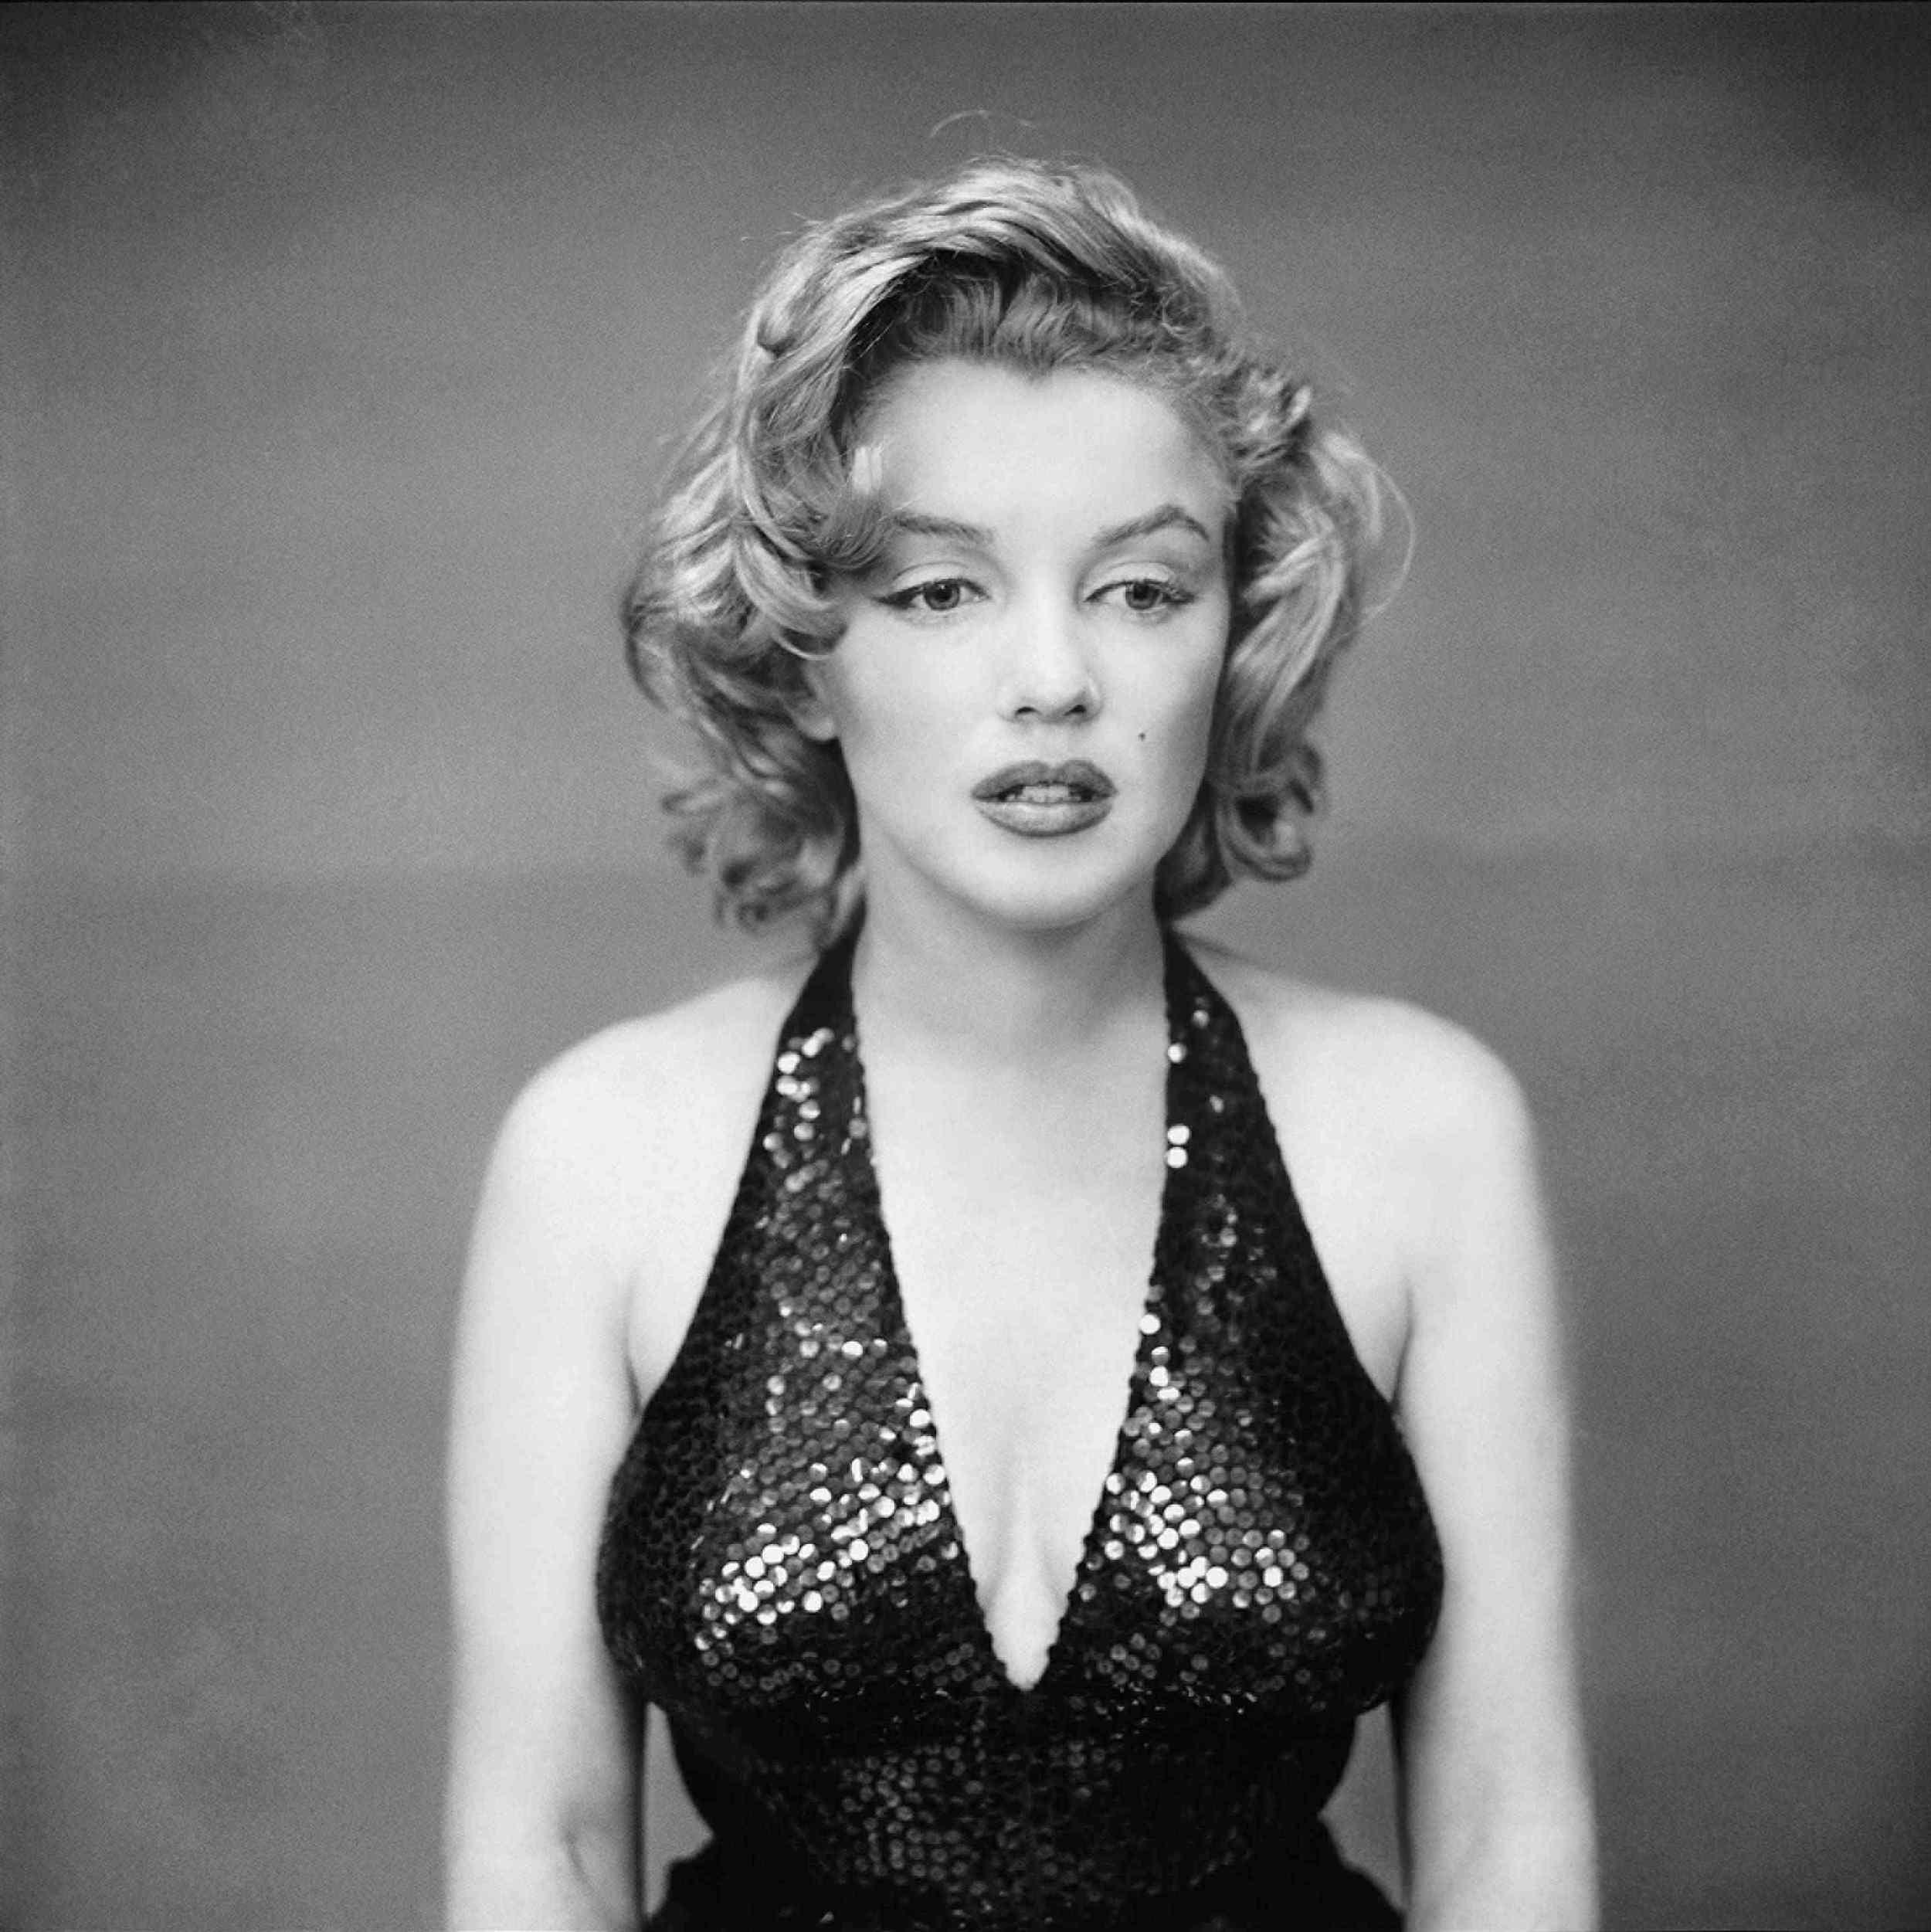 Marilyn Monroe New York City 1957